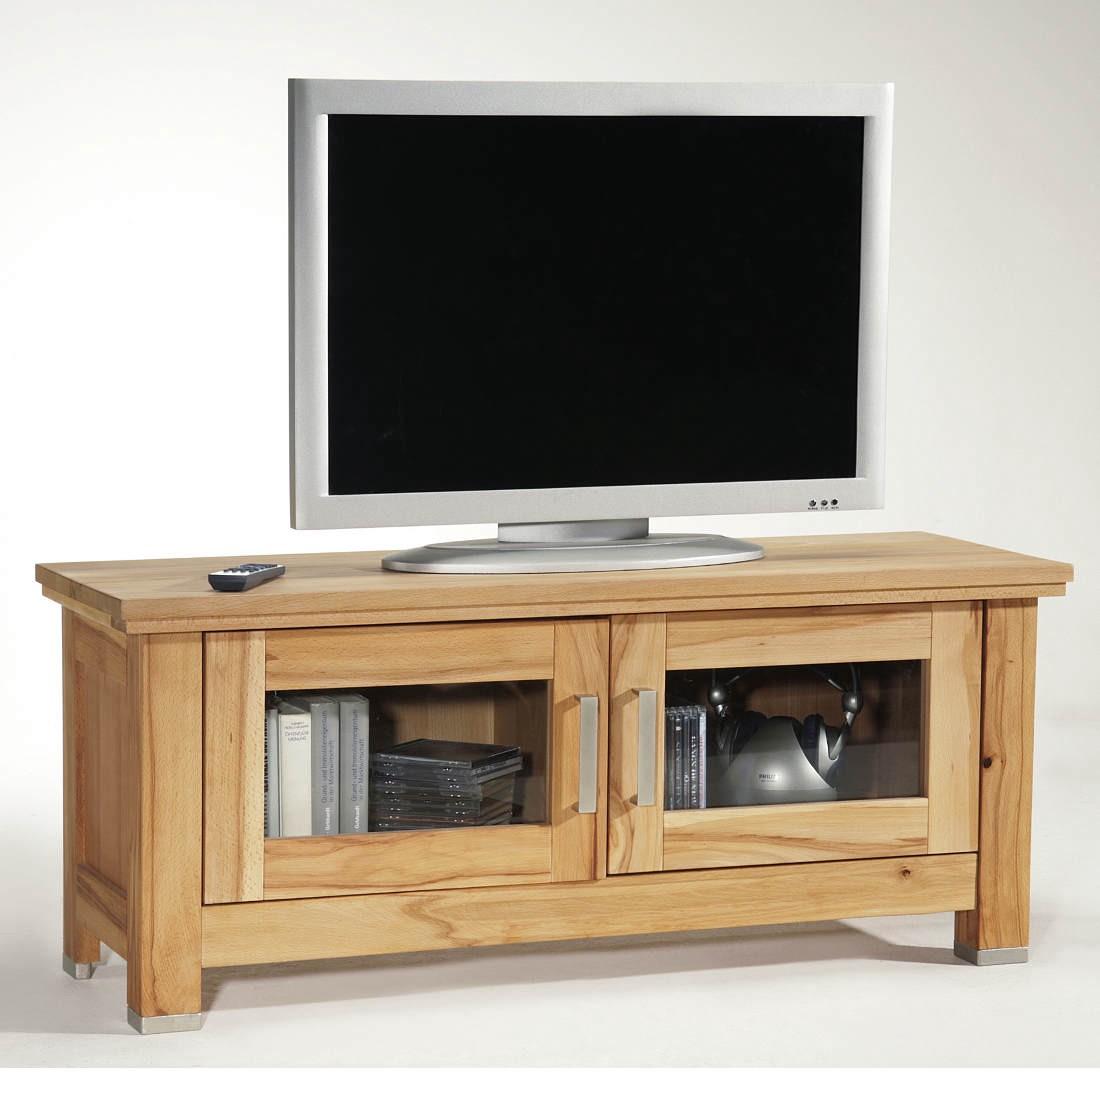 Meuble tv meuble tv 50cm hauteur chene meuble tv 50cm - Meuble tv hauteur 50 cm ...